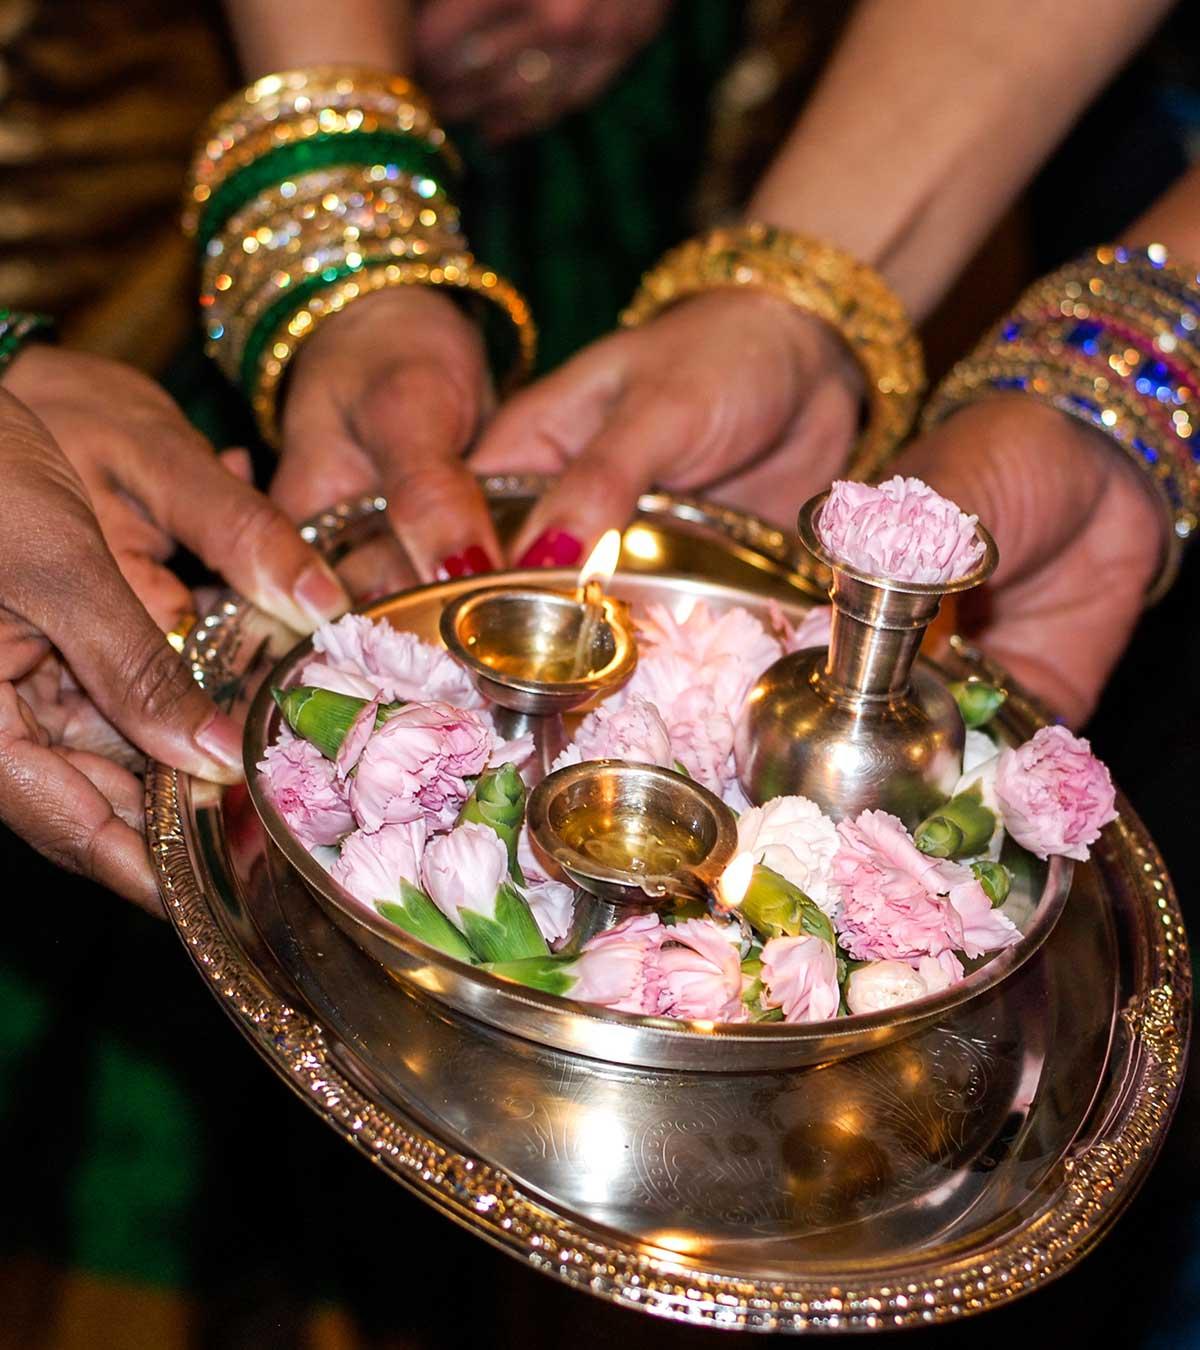 Indian baby Bangles|Indian kids Bangles||return gift Bangles Baby shower bangles decor|indian girl kids dress bangles|Indian Return Gifts